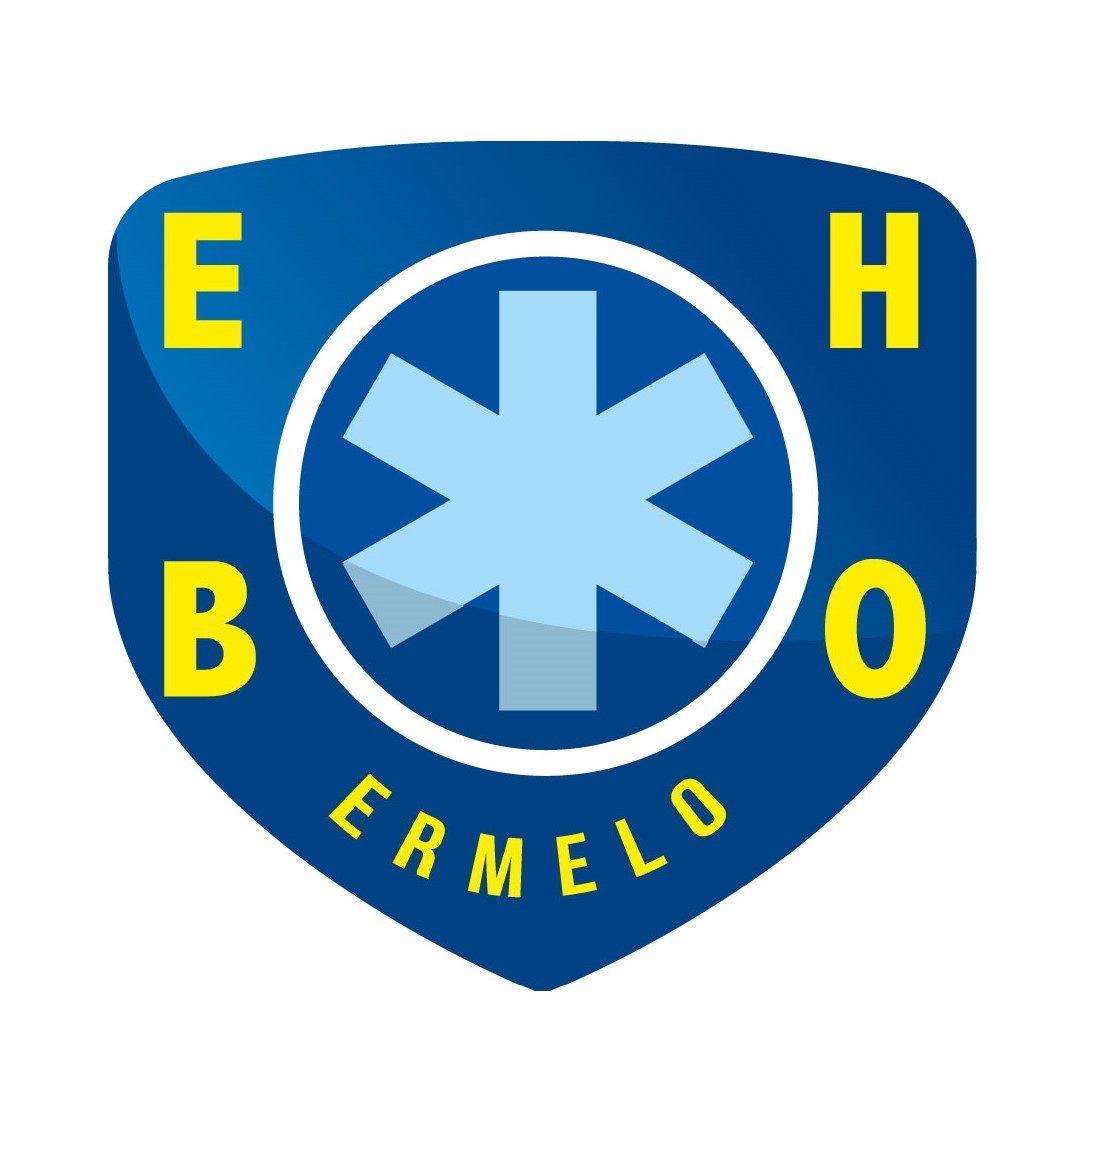 EHBO-vereniging Ermelo